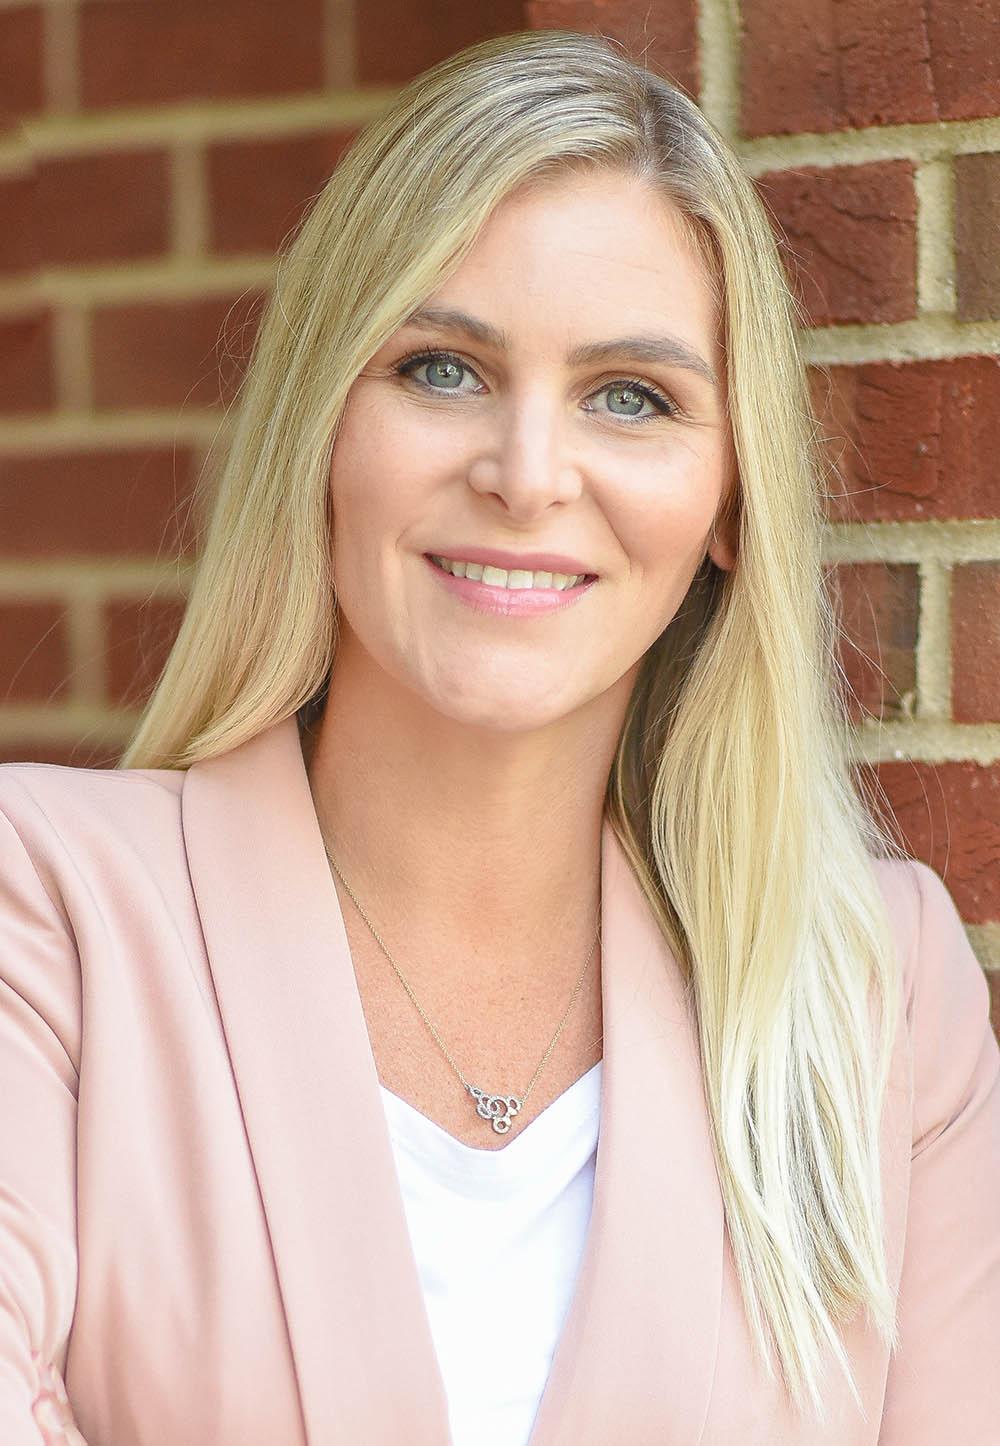 Ashley Lisk